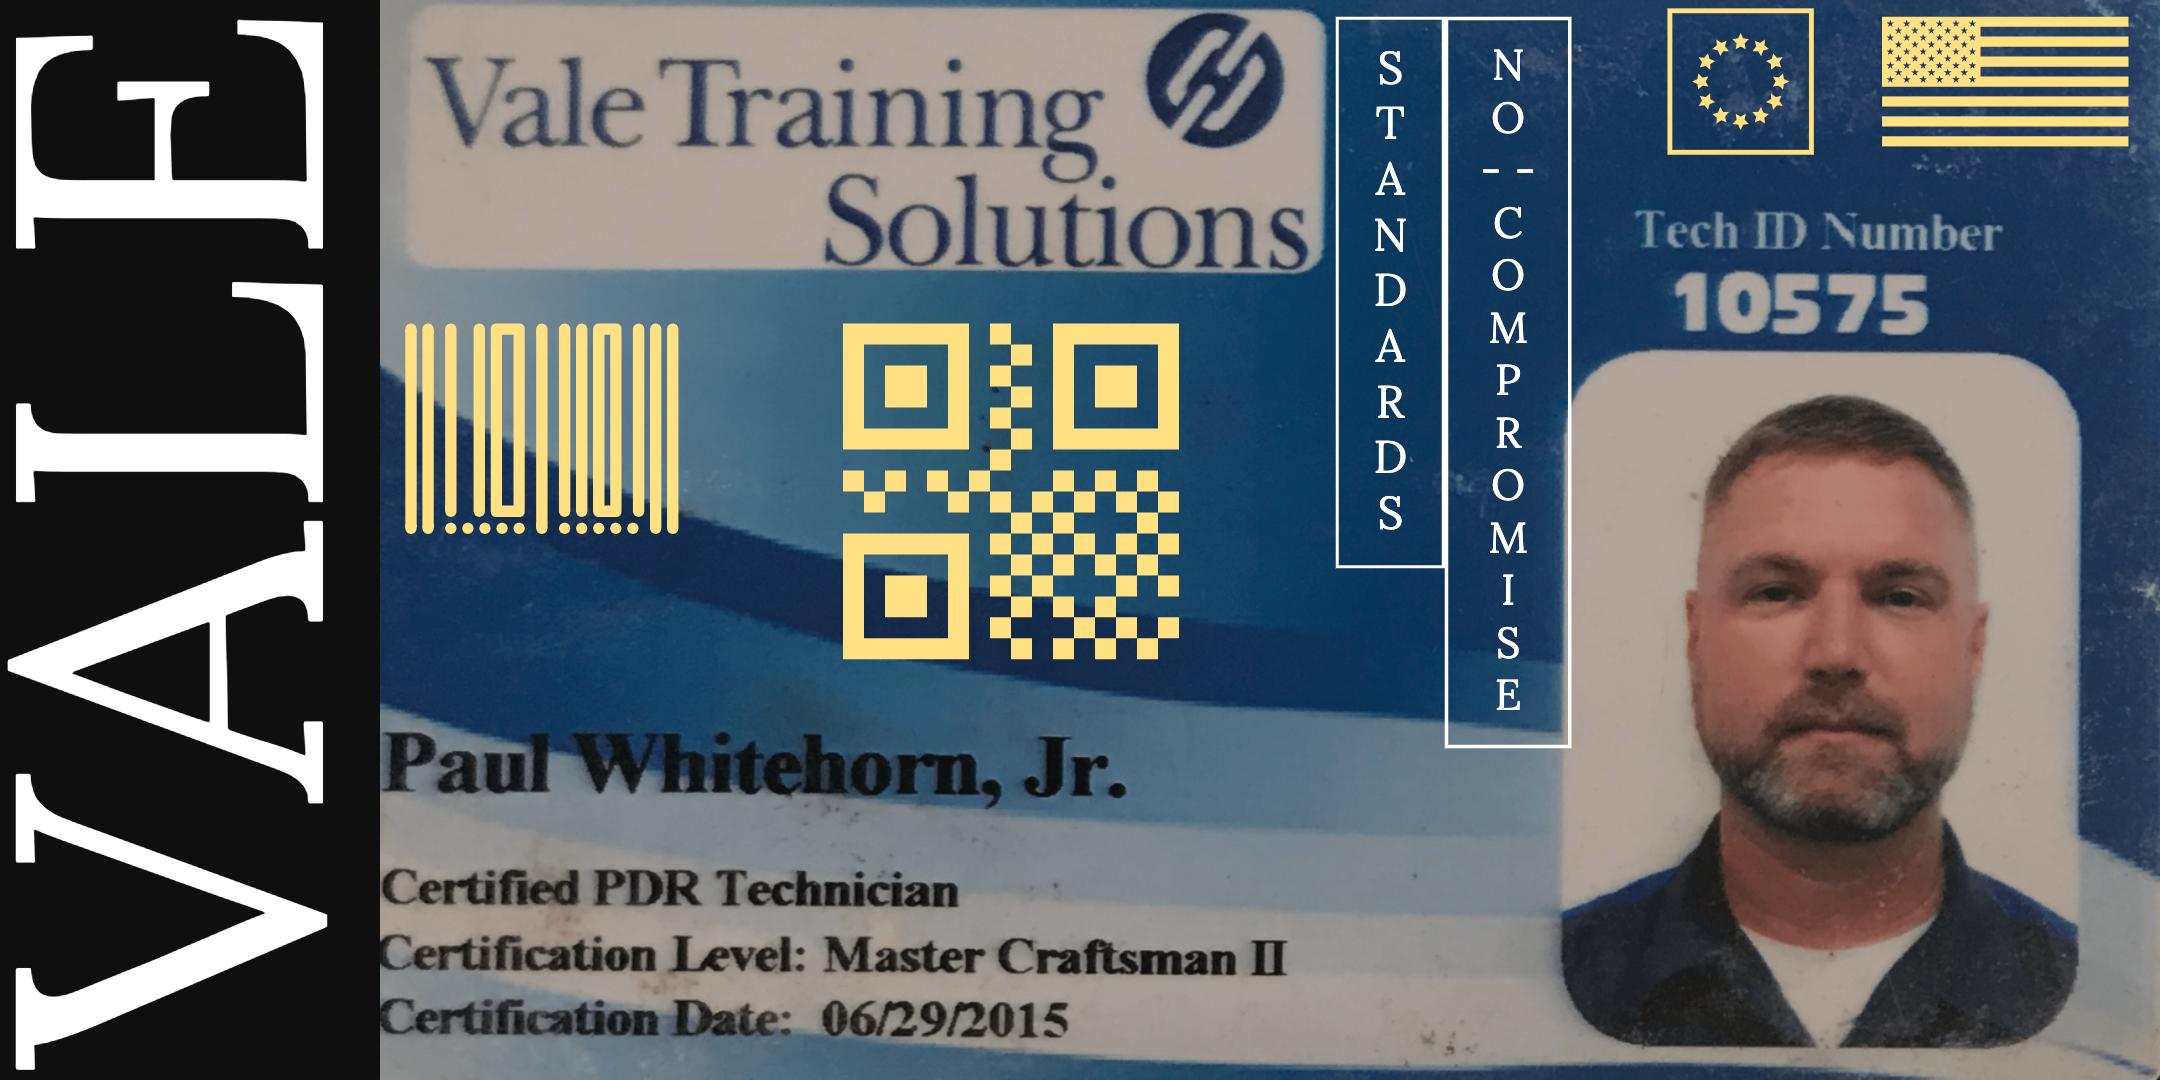 Vale Certification